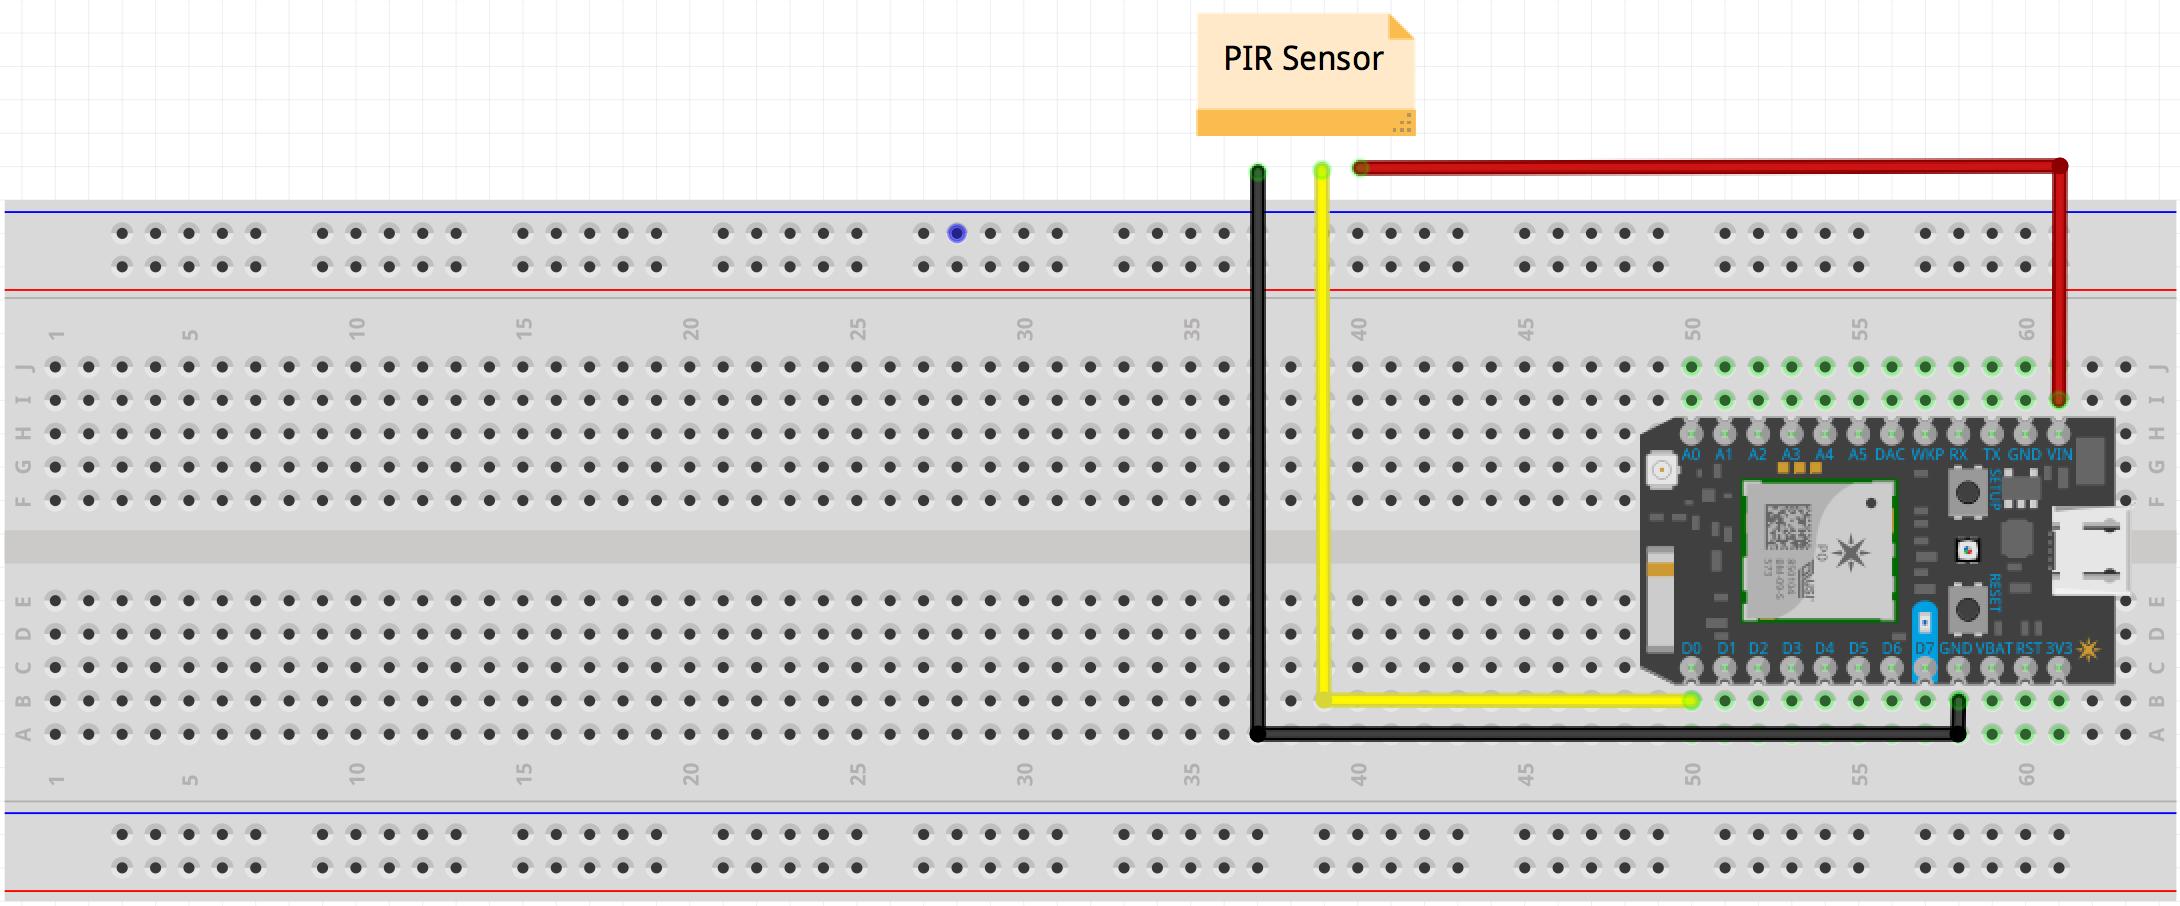 Pir circuit m4kednbcsi